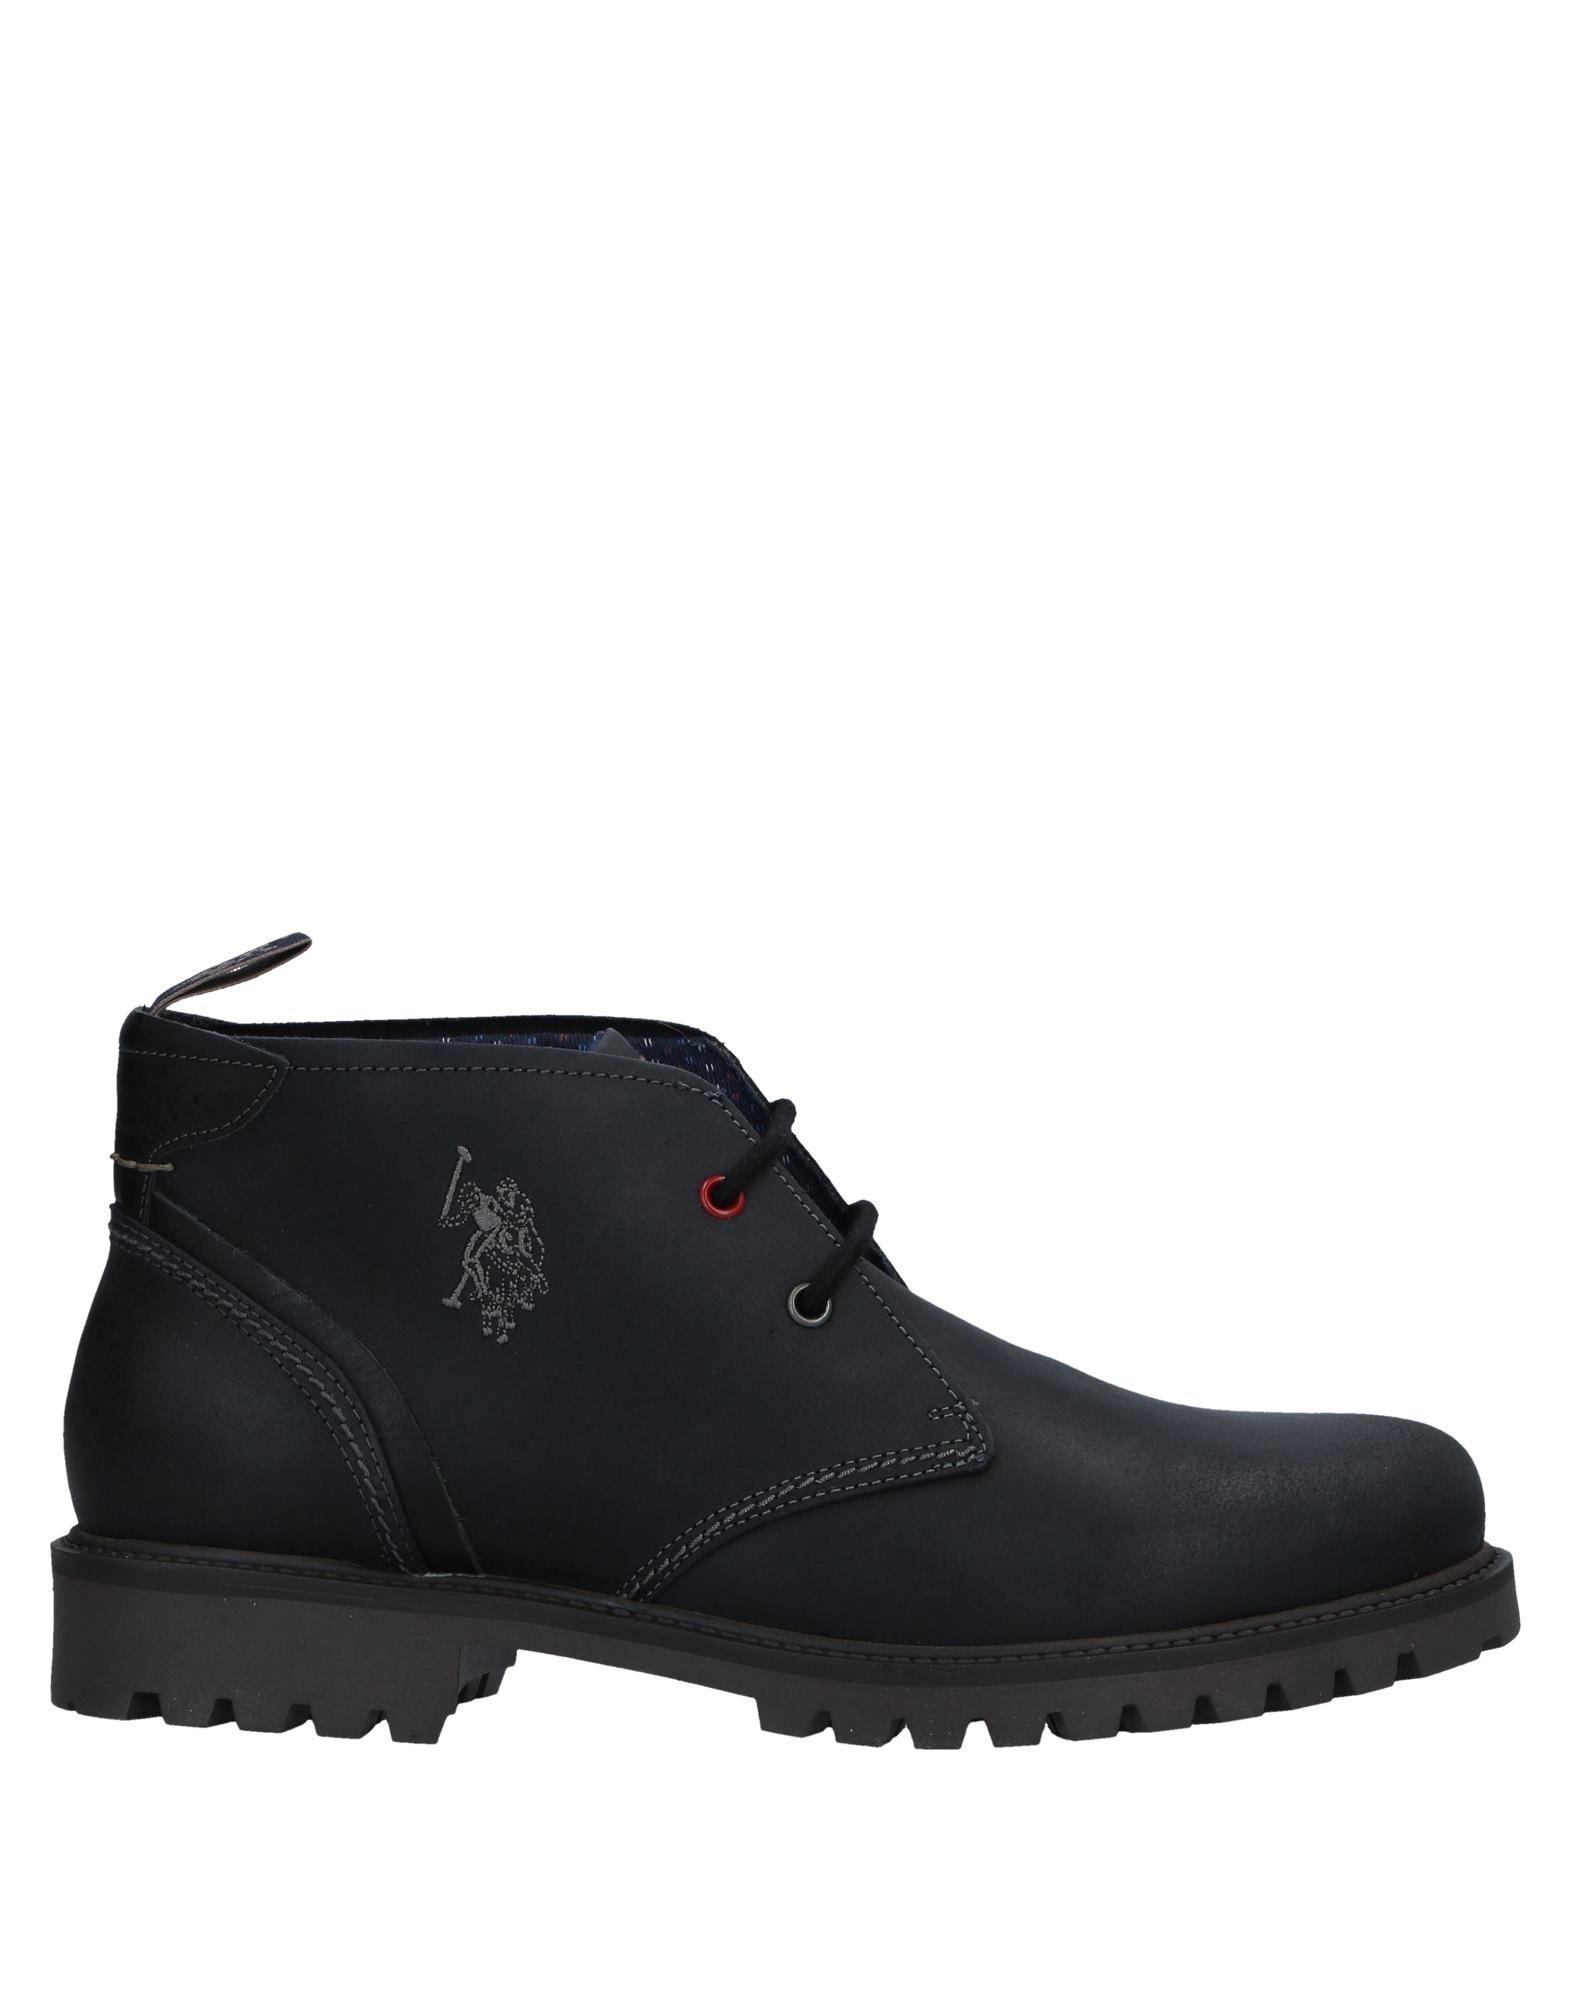 Rabatt echte Schuhe Herren U.S.Polo Assn. Stiefelette Herren Schuhe  11517729SL 8be604